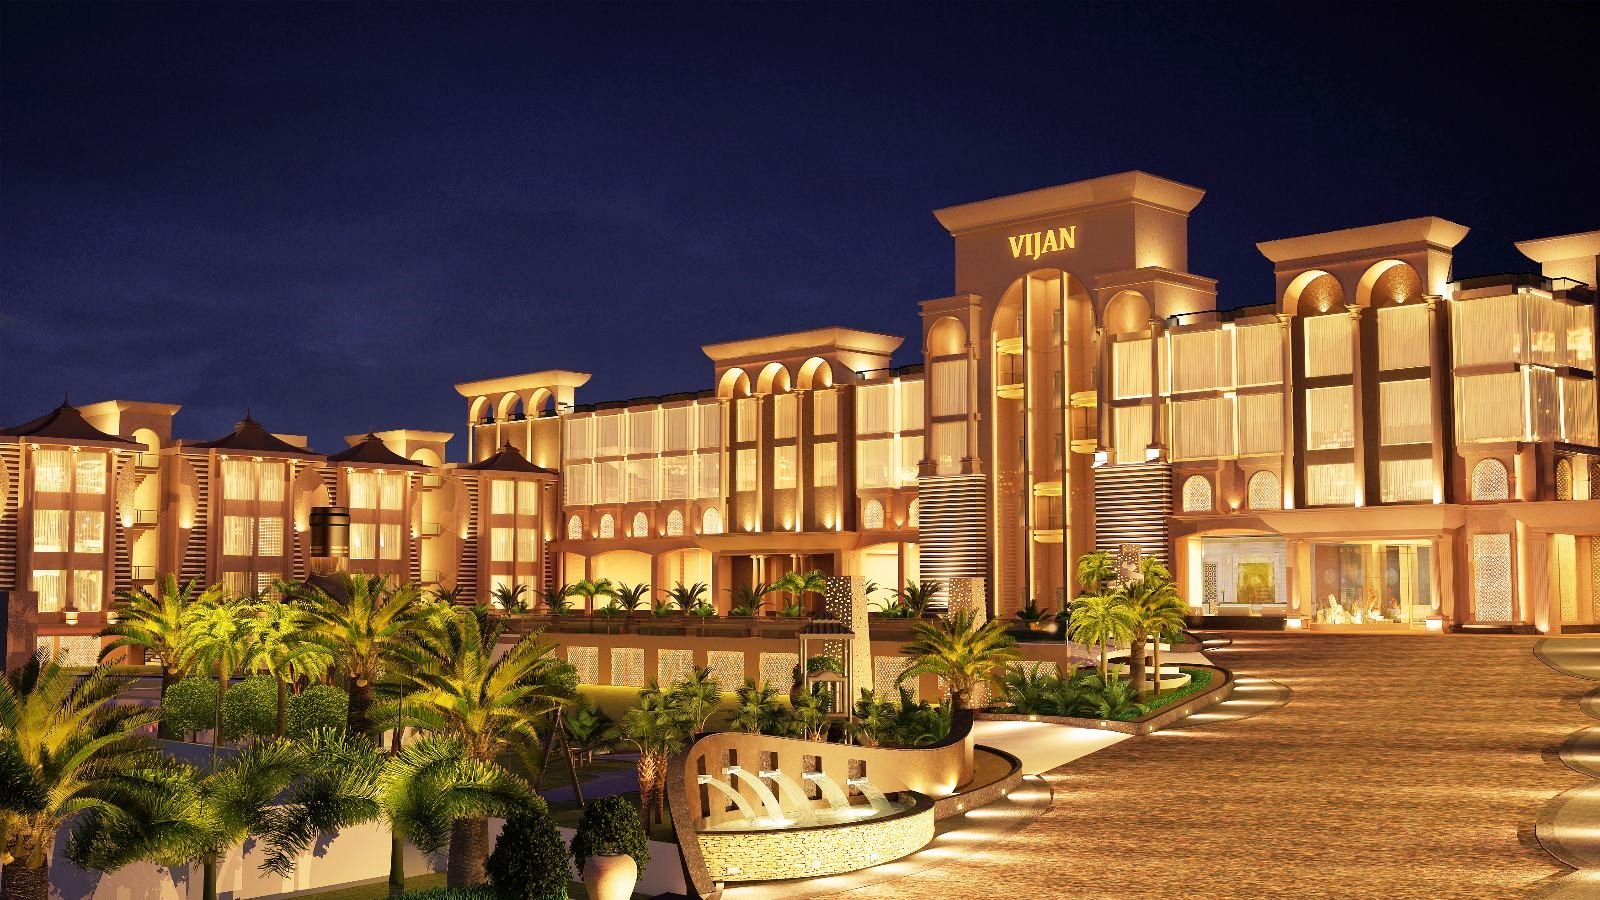 Vijan Mahal Jabalpur Madhya Pradesh Resort Reviews  : getlstd property photo from www.tripadvisor.in size 1600 x 900 jpeg 302kB